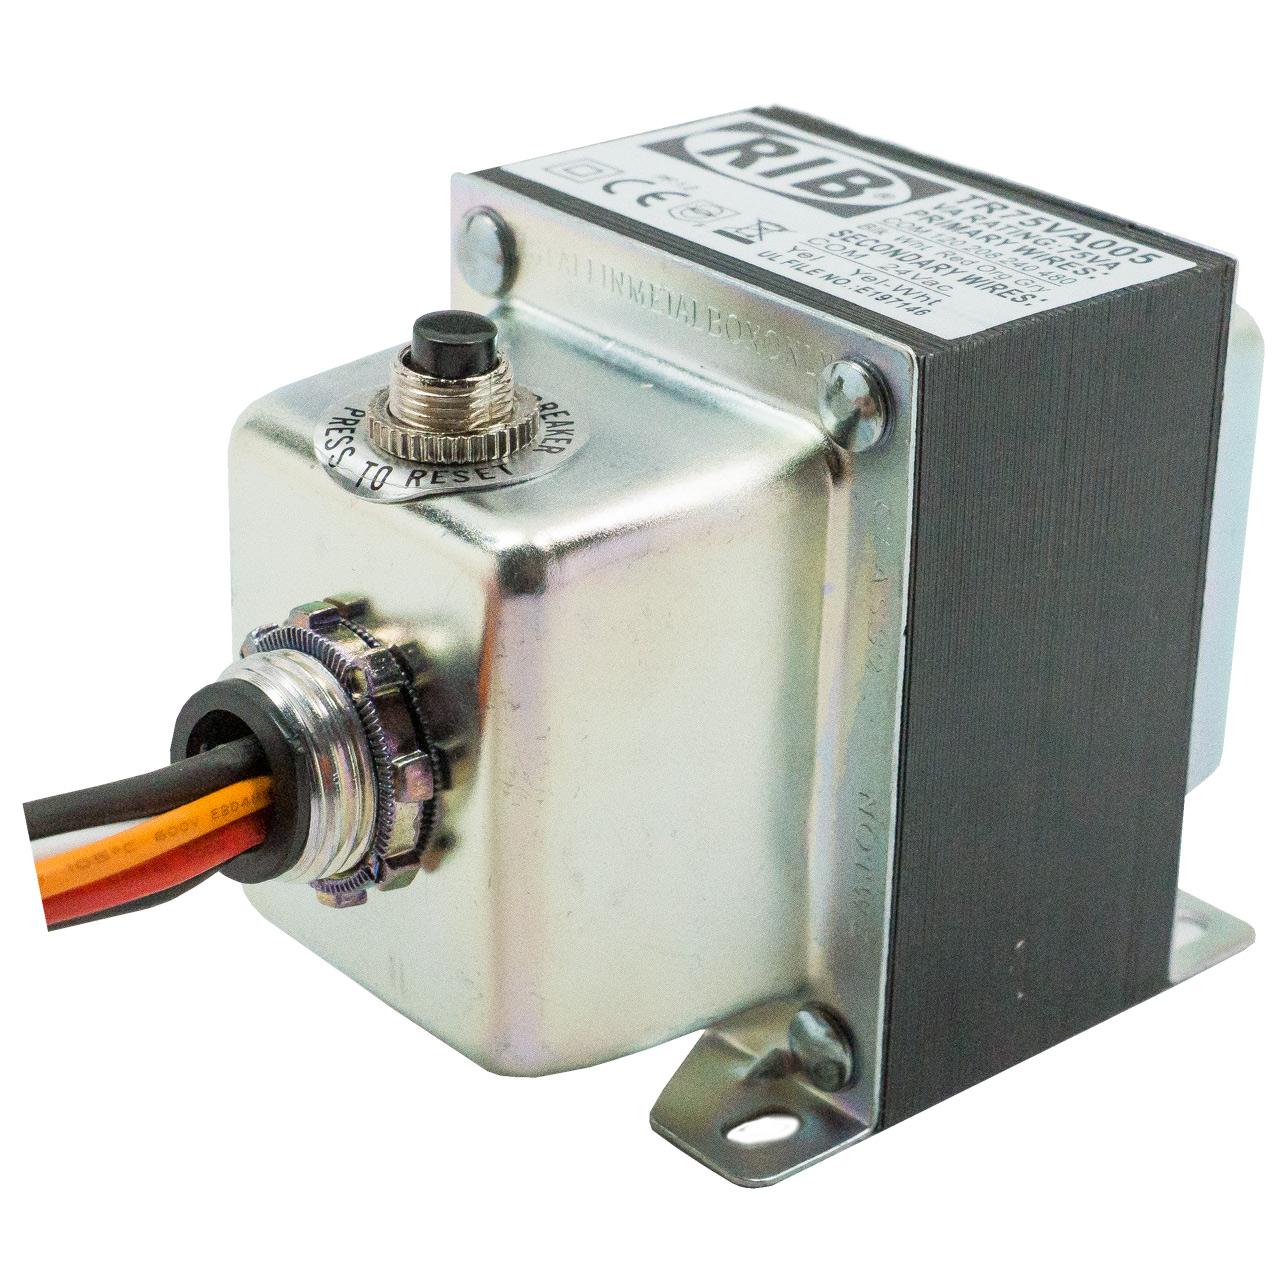 00344538 wiring diagram ribu2c rib gandul 45 77 79 119 ribu2c wiring diagram at edmiracle.co